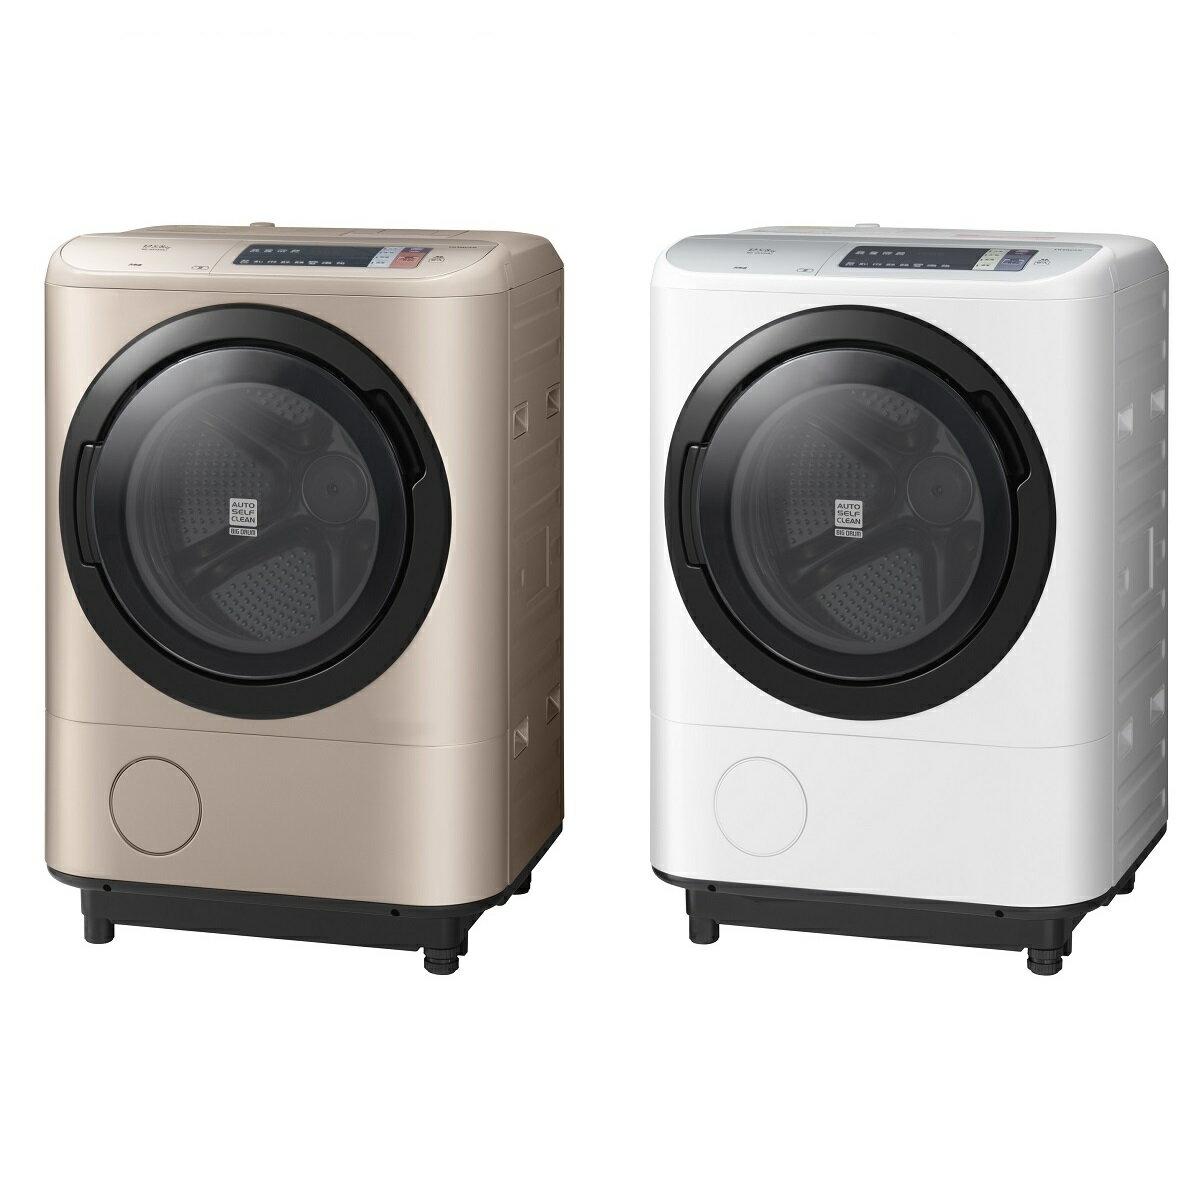 HITACHI 日立 BDNX125AJ 溫水擺動式飛瀑滾筒洗脫烘洗衣機(12.5KG)(香檳金/星燦白) ~日本原裝~【07-7428010】